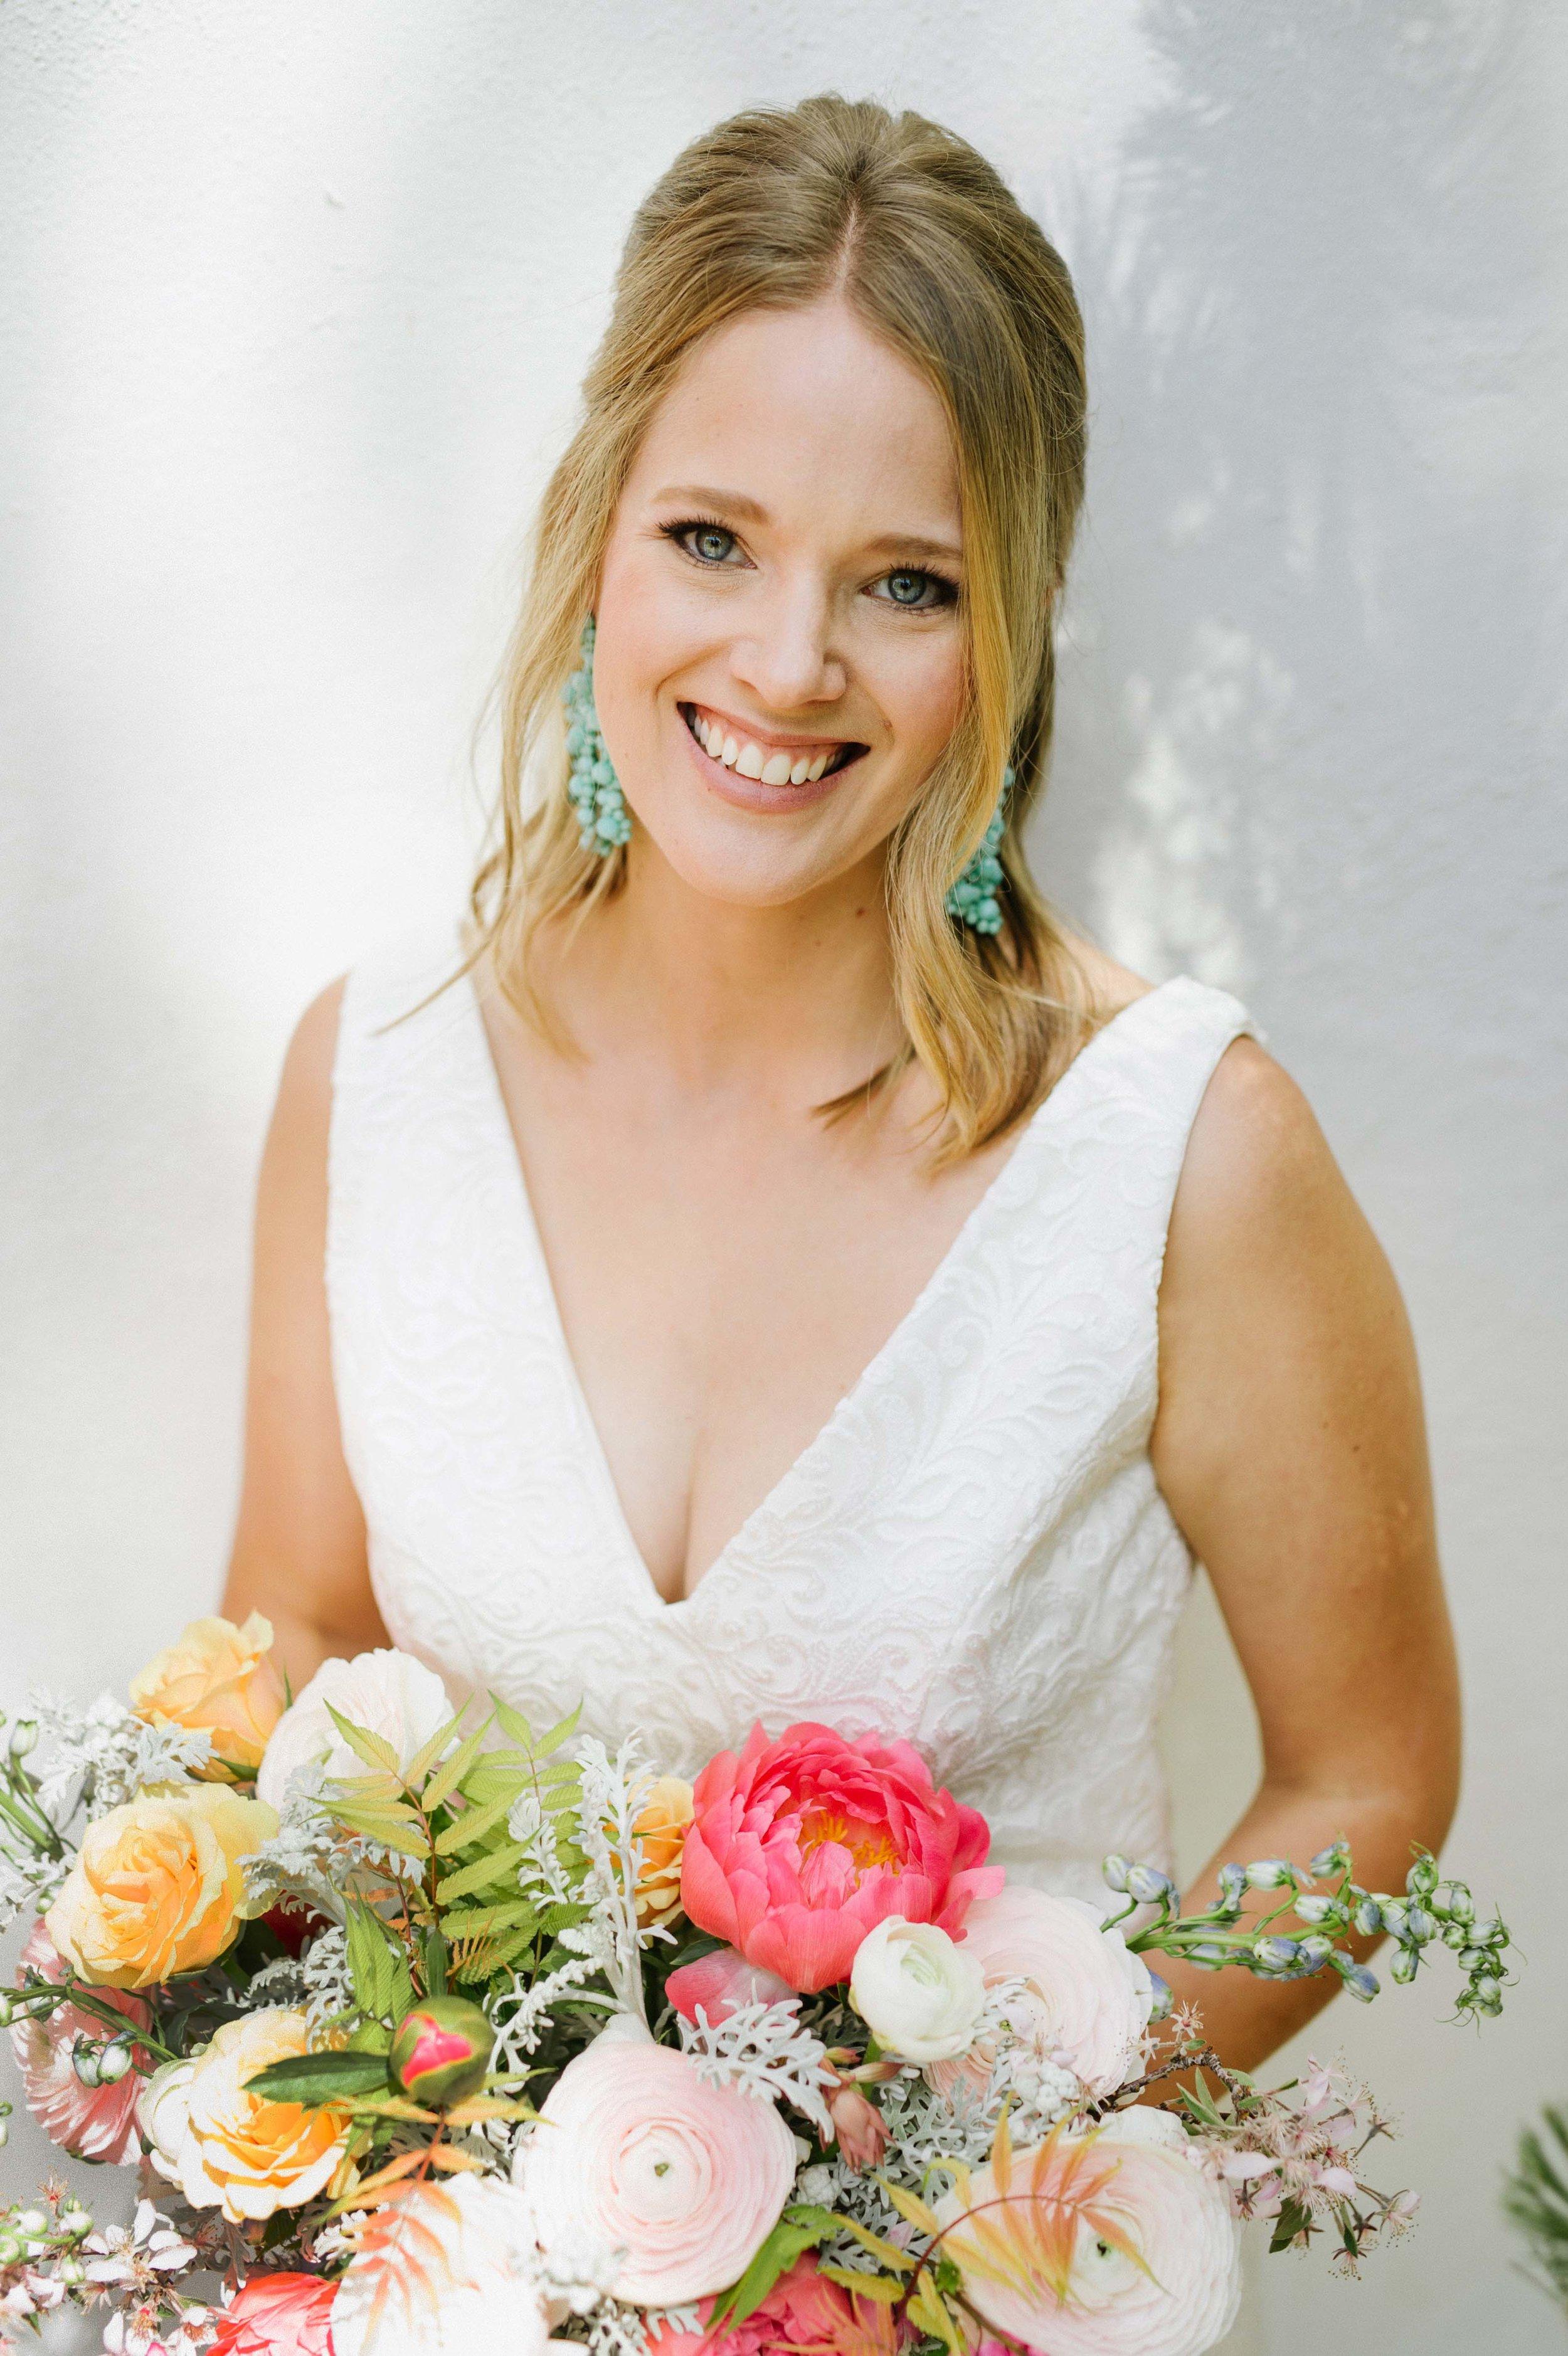 Christy-D-Swanberg-Photography-Calgary-wedding-elopement-17.jpg